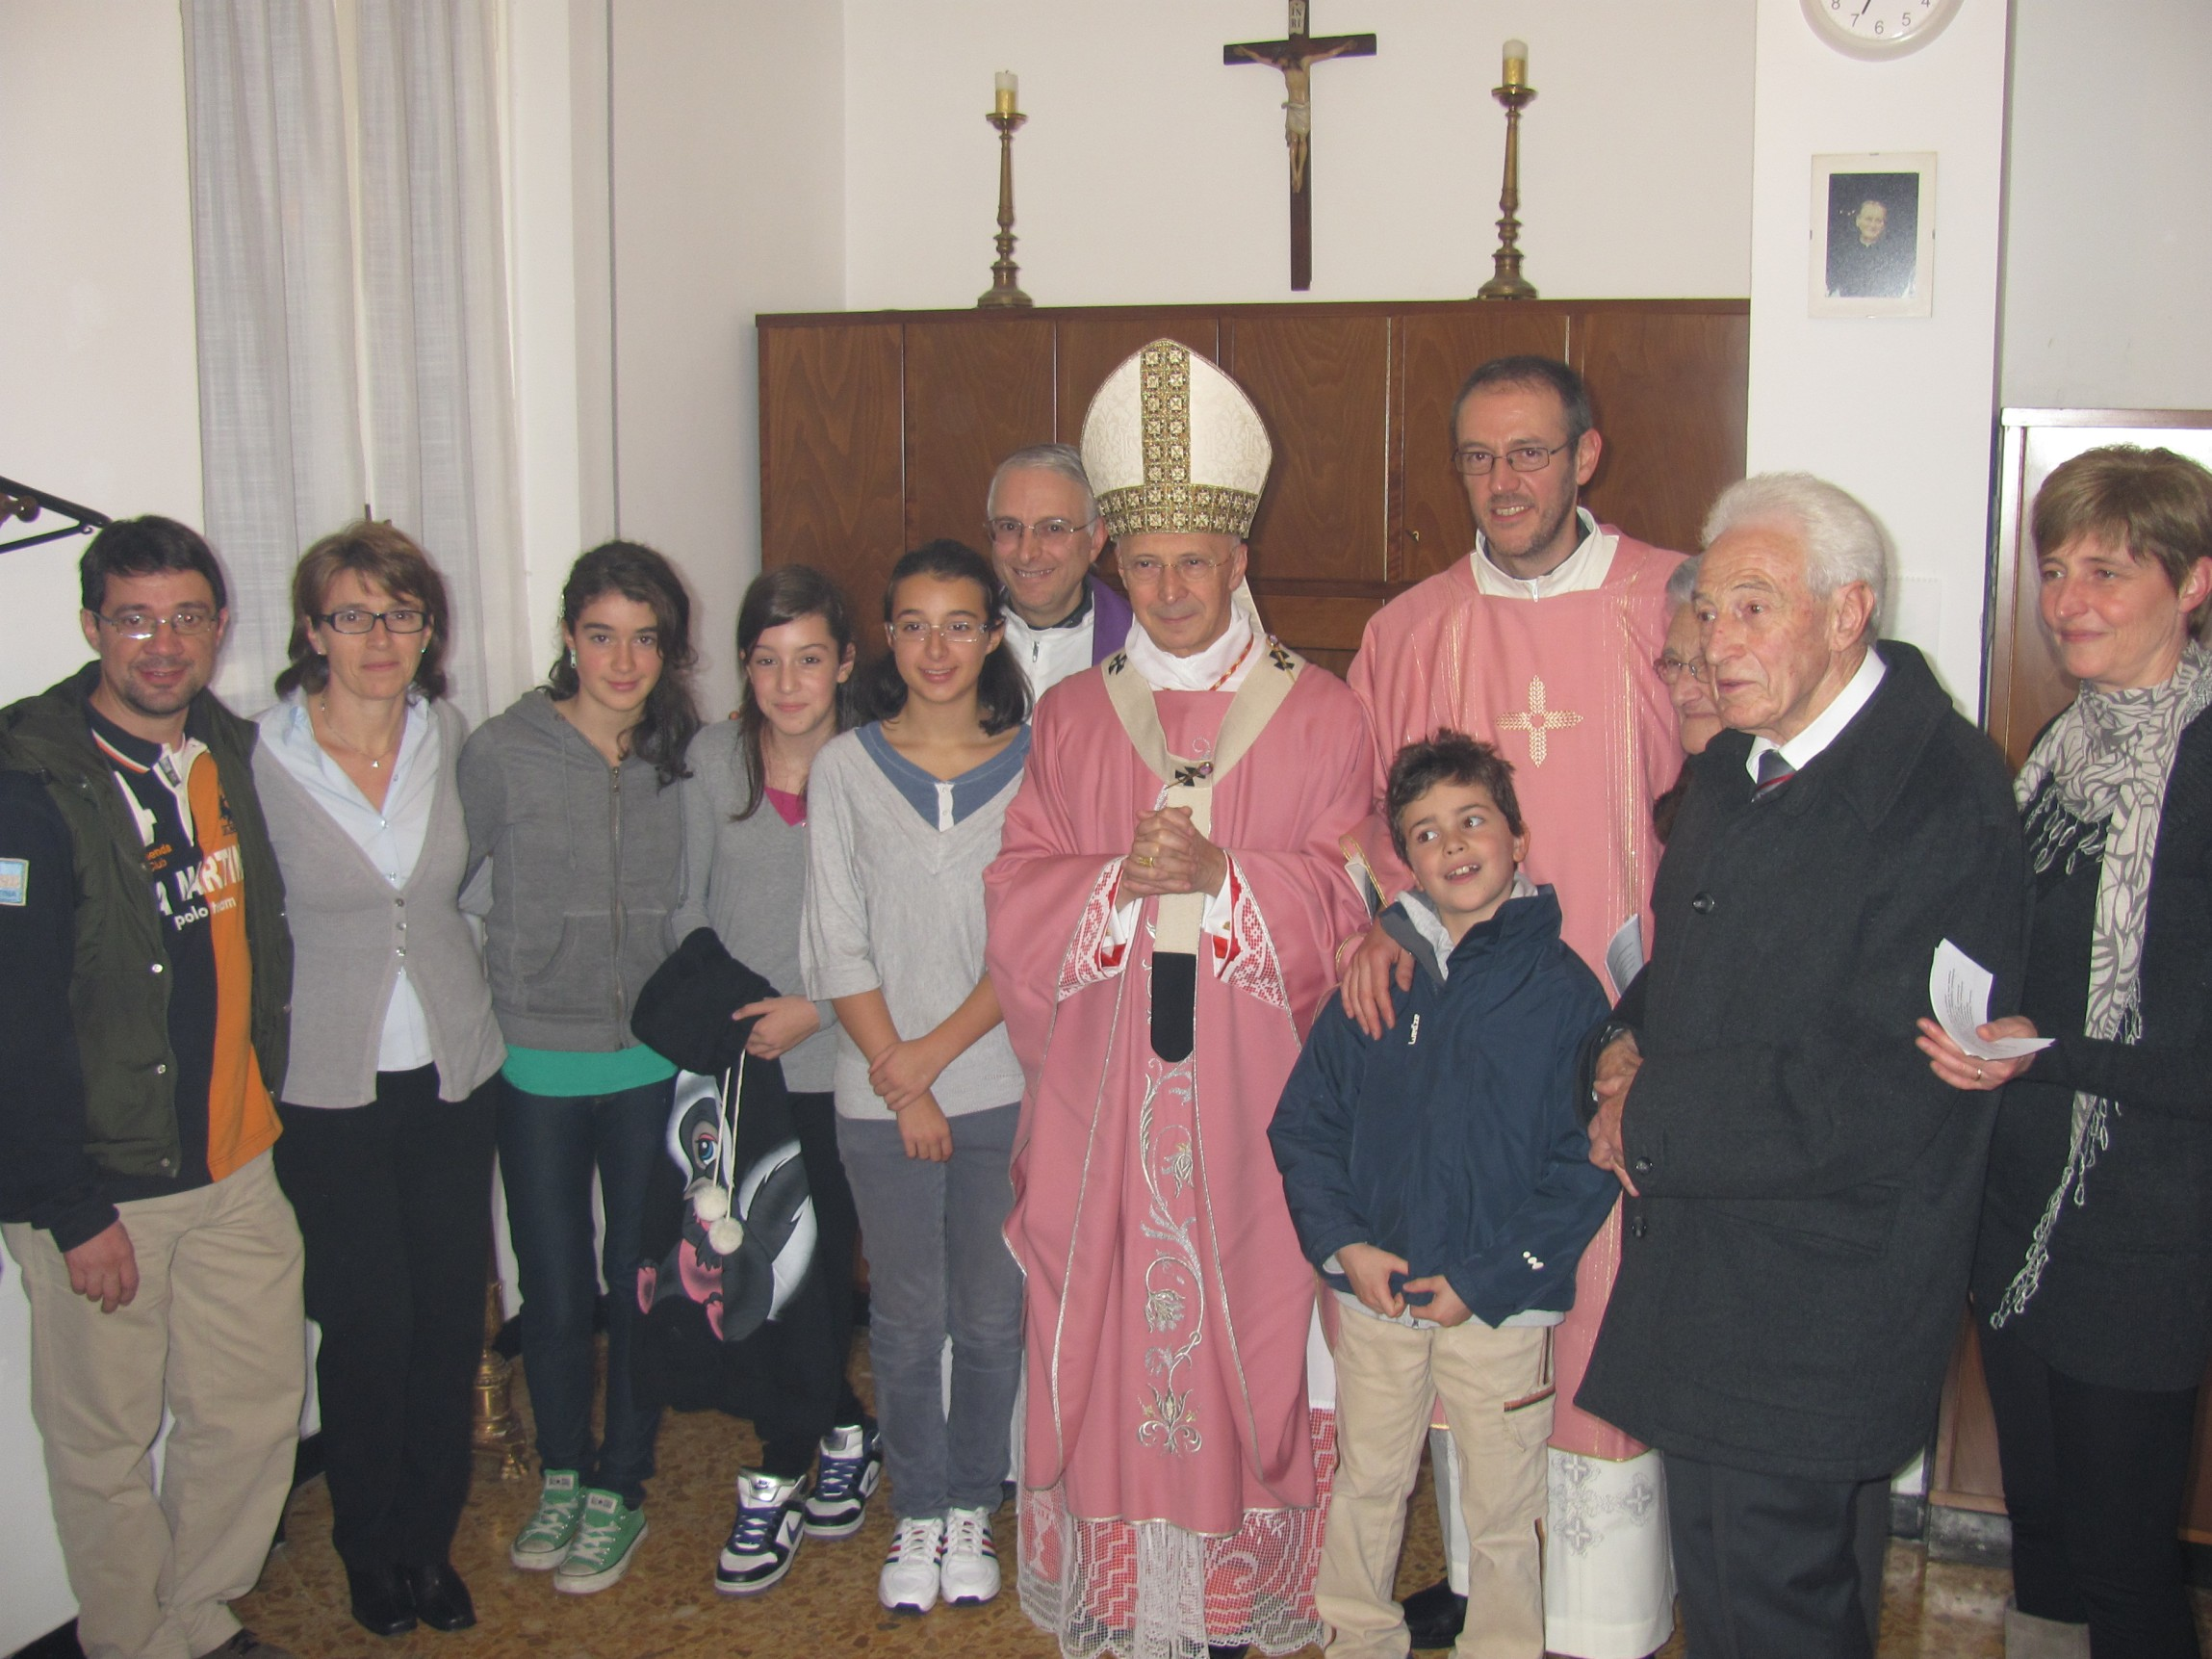 ingresso_giun_spirito_santo_2011-12-11-18-57-49